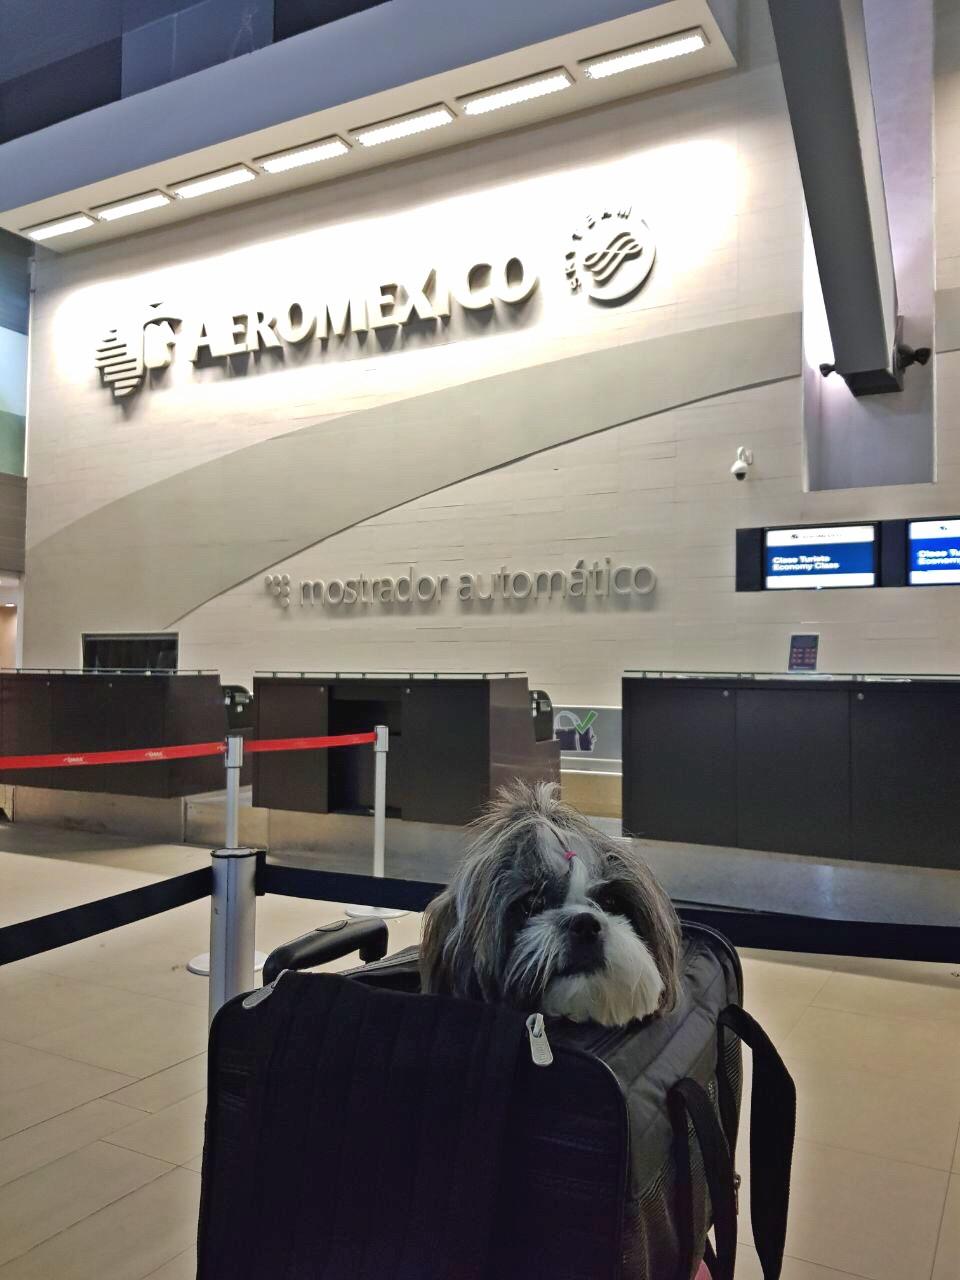 AeroMexico 1.JPG